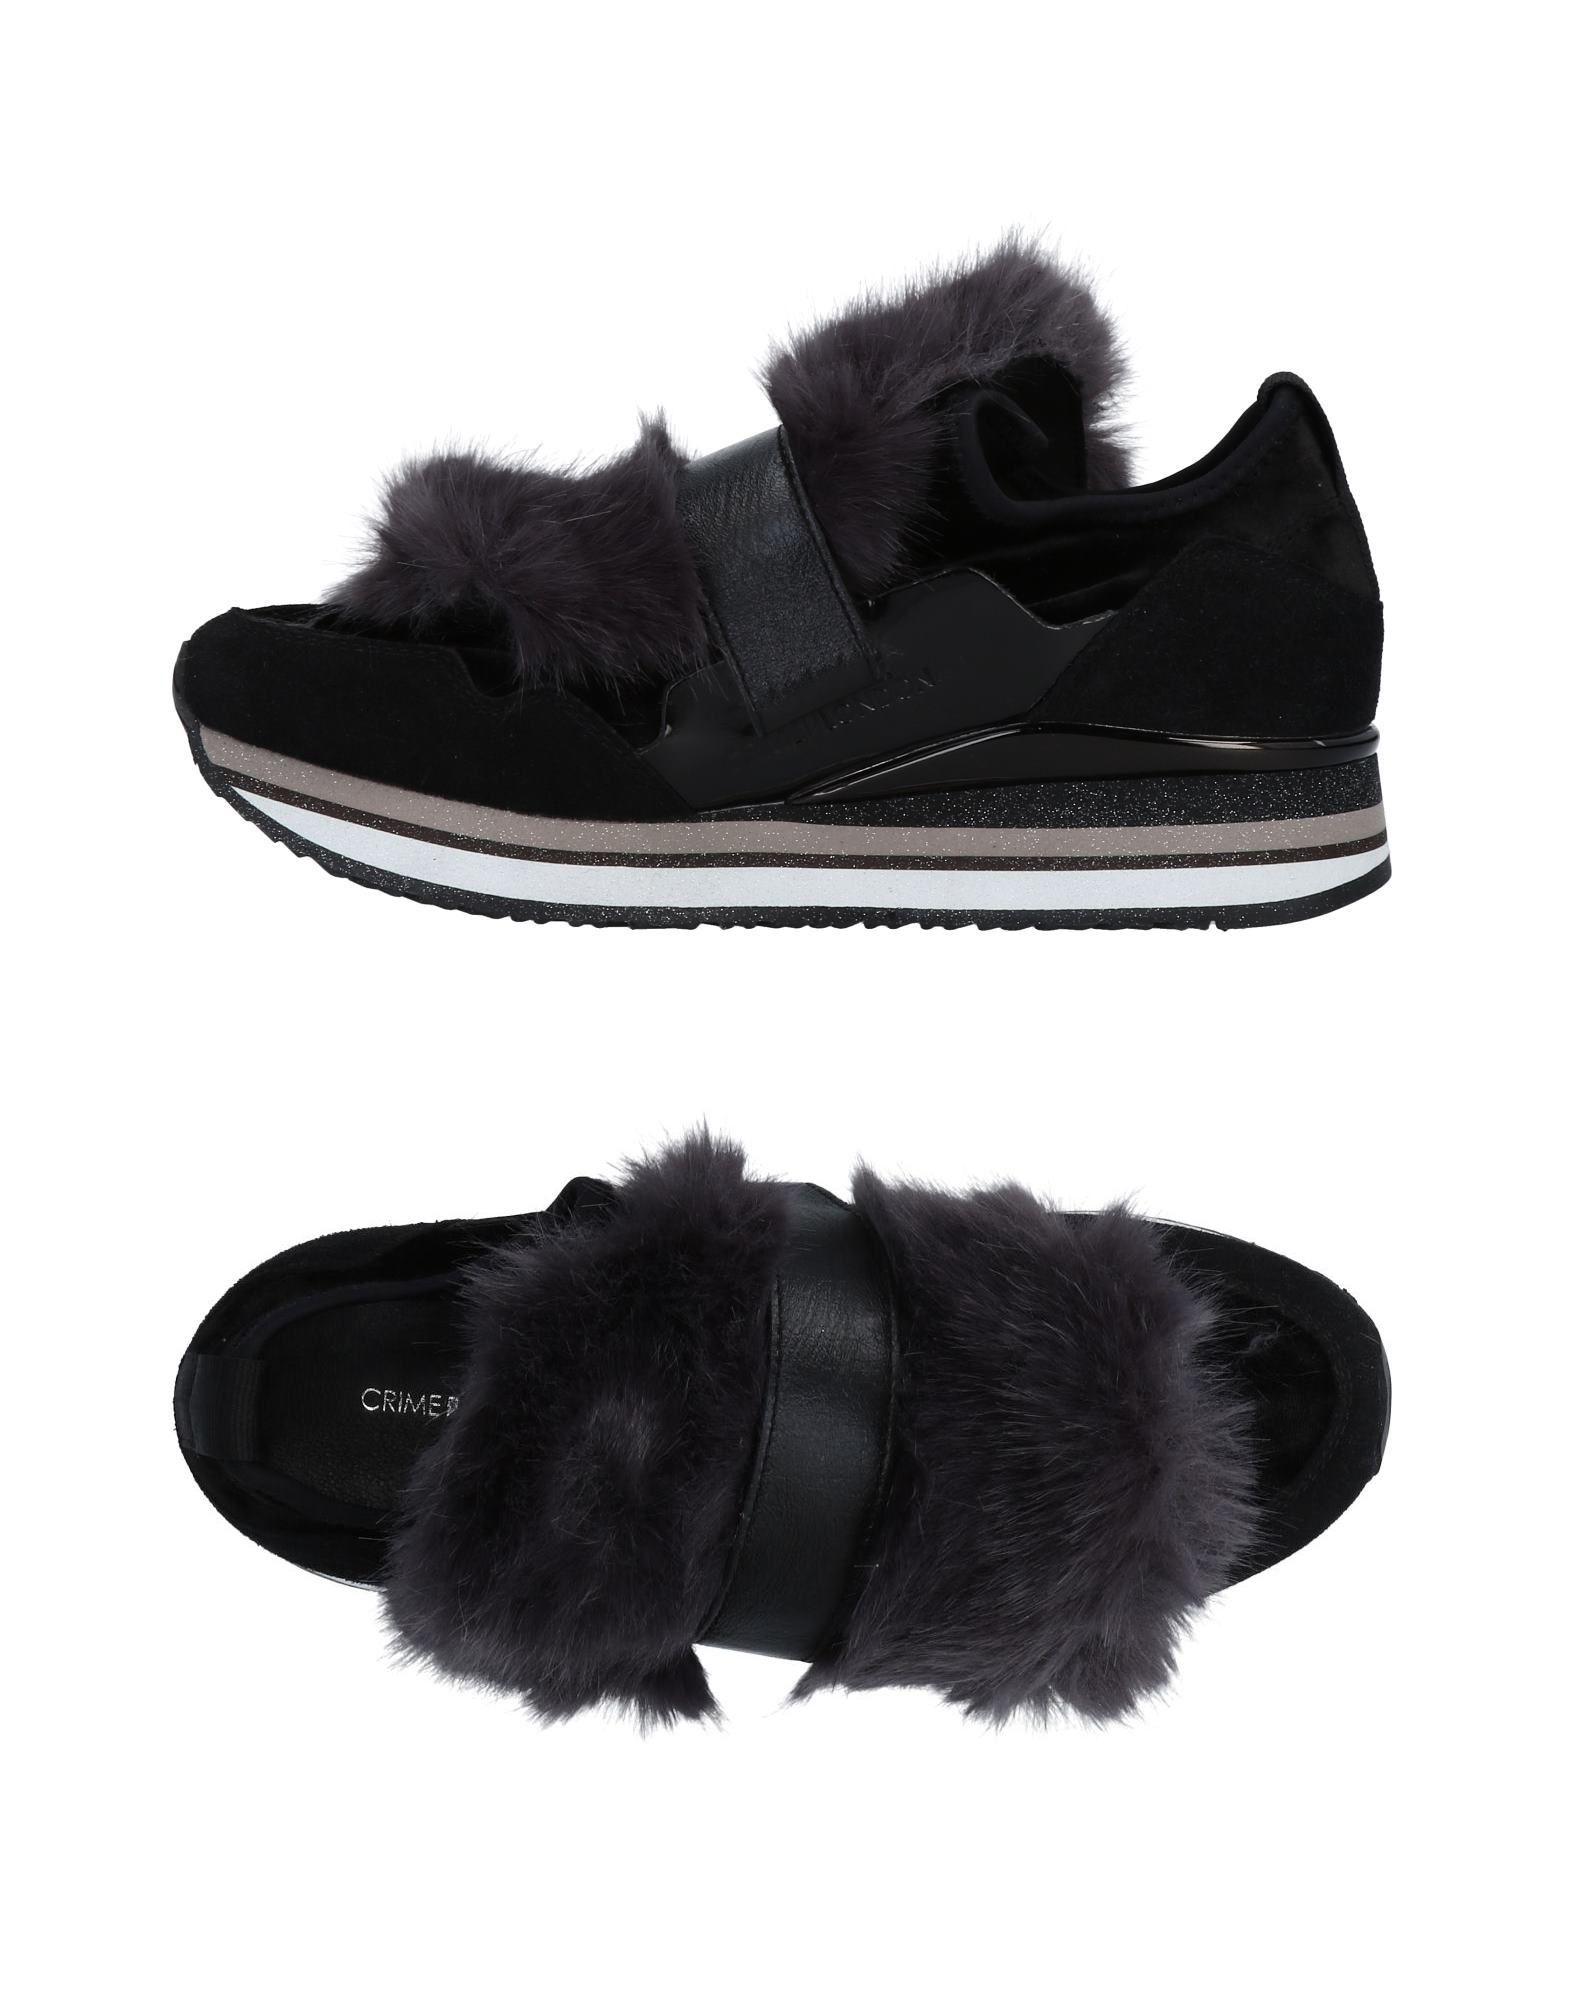 Crime London Turnschuhes Damen 11483682HB Gute Qualität beliebte Schuhe